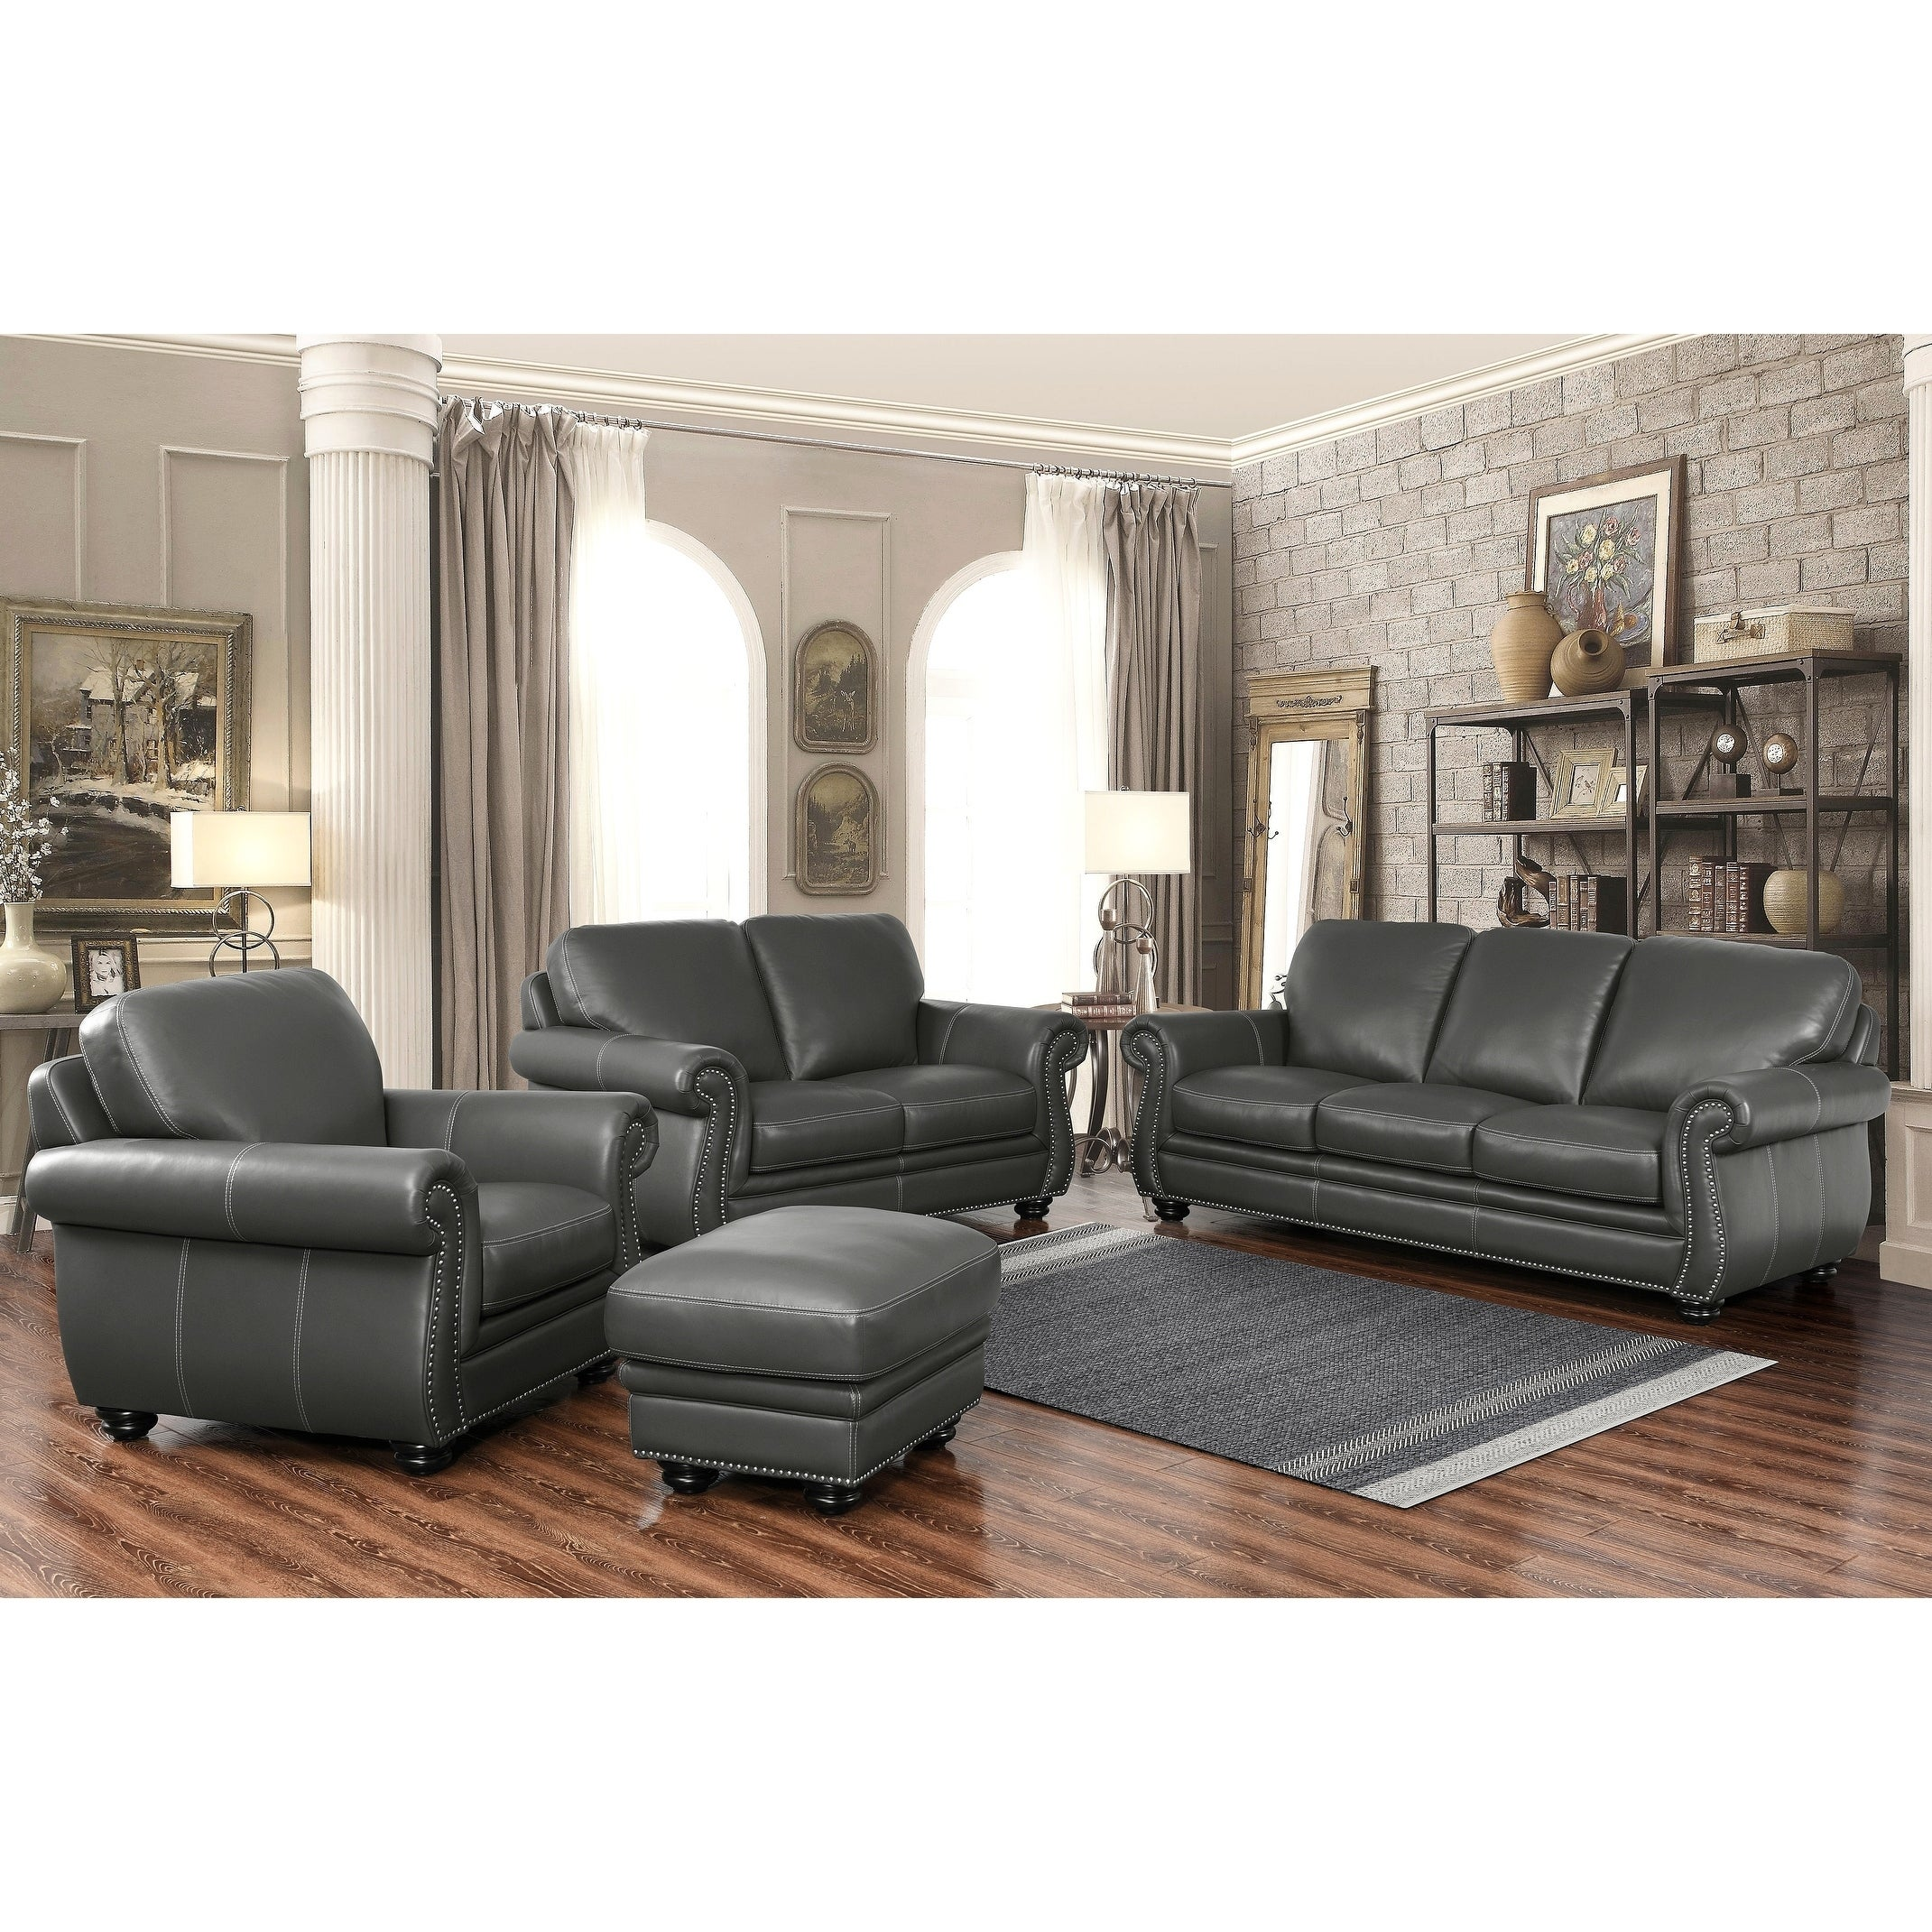 Shop Abbyson Kassidy Grey Top Grain Leather 4 Piece Living Room Set ...